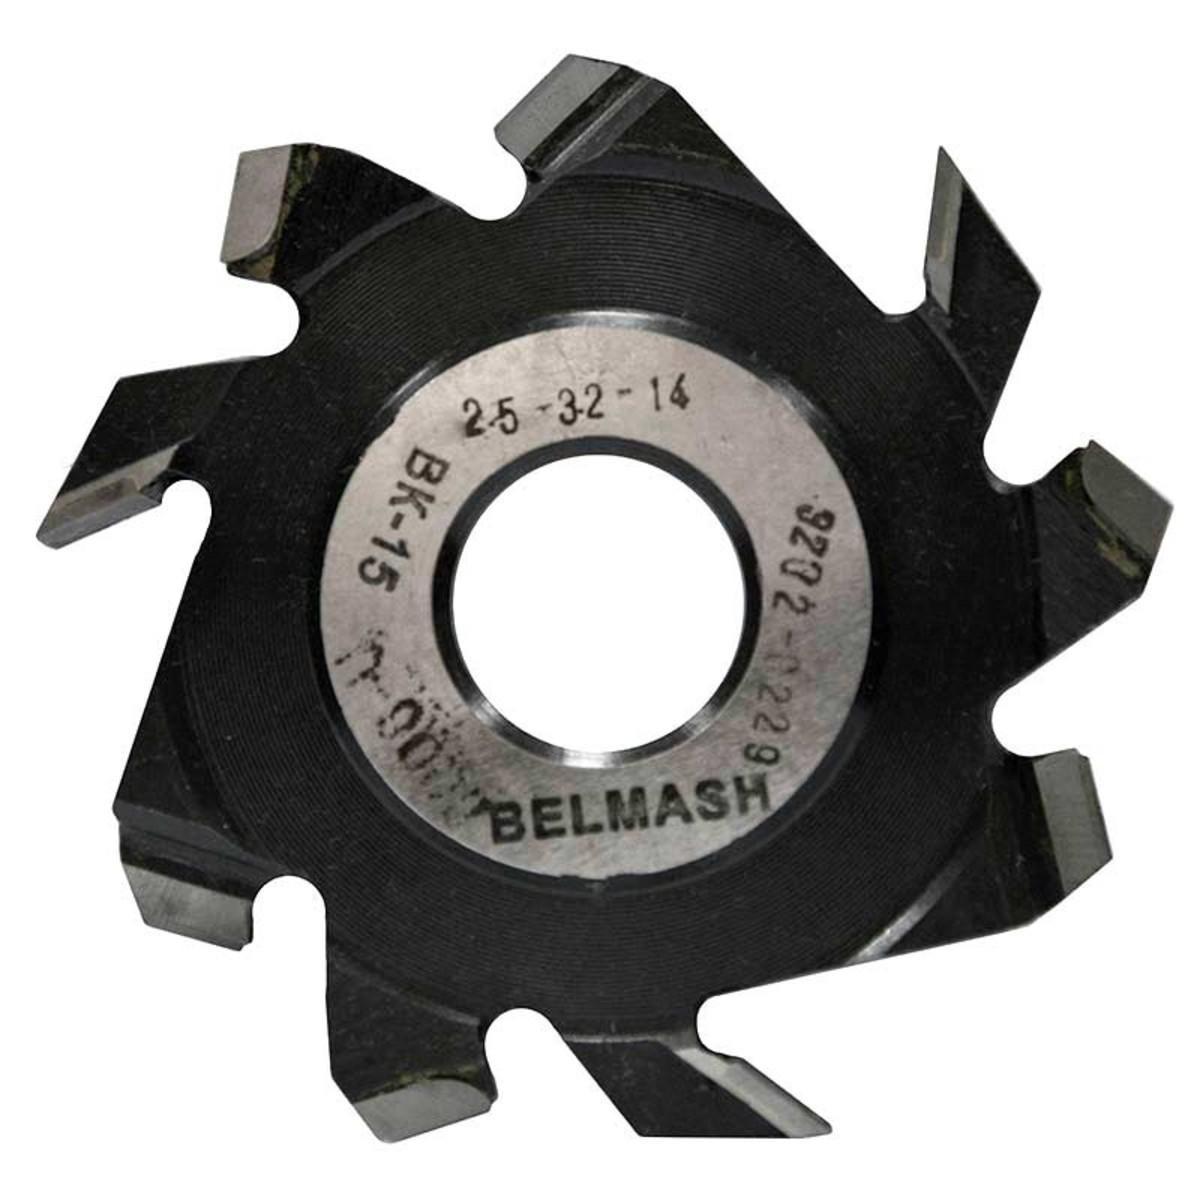 Фреза дисковая пазовая по дереву BELMASH 125x32x14 мм с подрезающими зубьями 9 зубьев